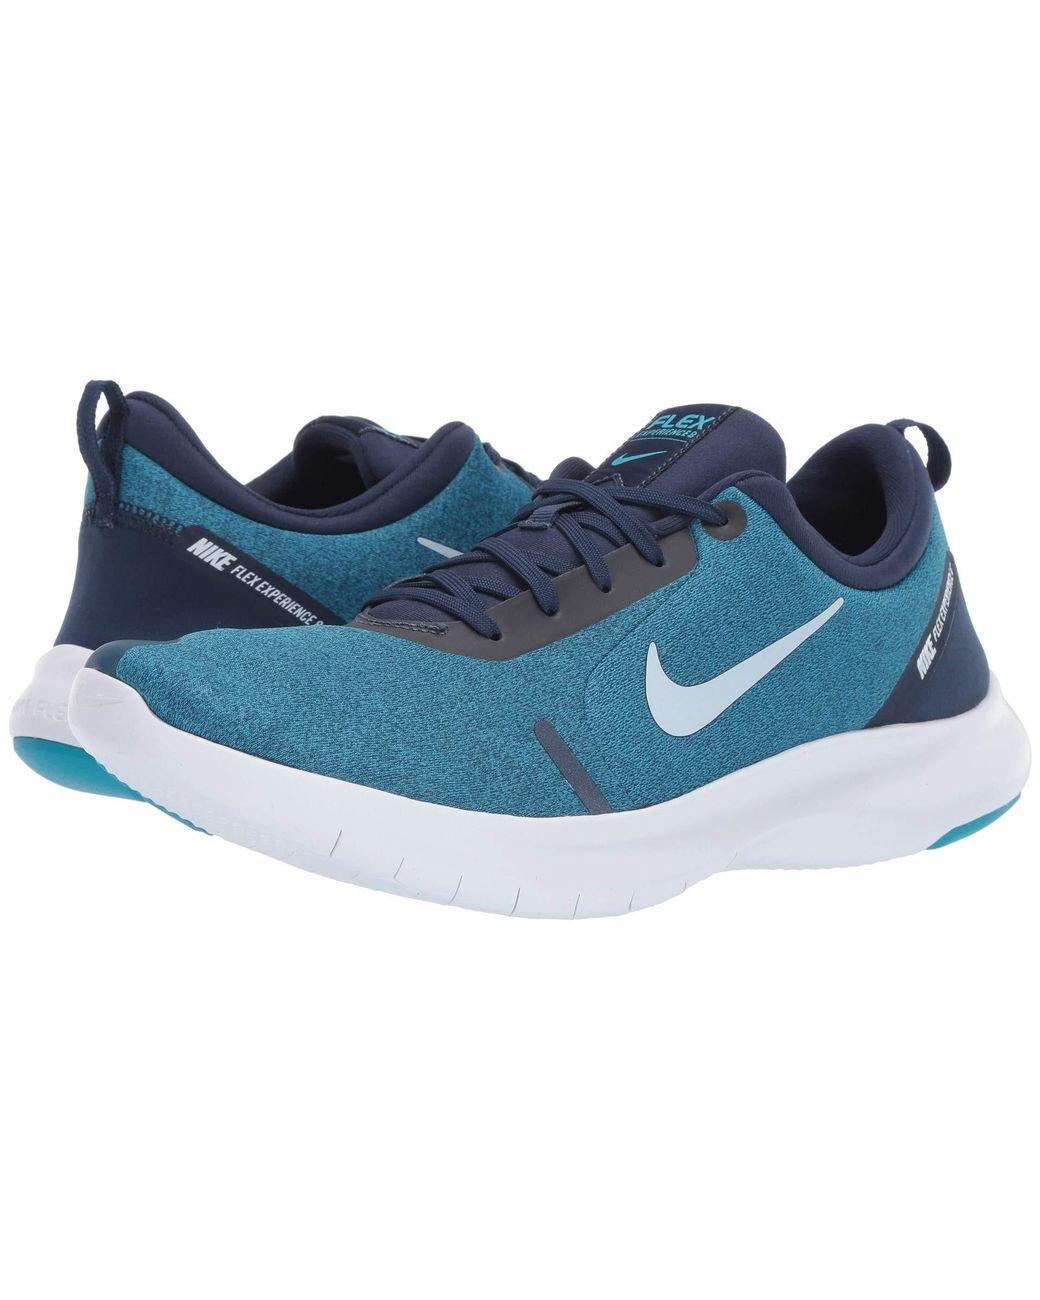 5062b49fa7ba Nike. Flex Experience Rn 8 (midnight Navy white monsoon Blue) Men s Running  Shoes